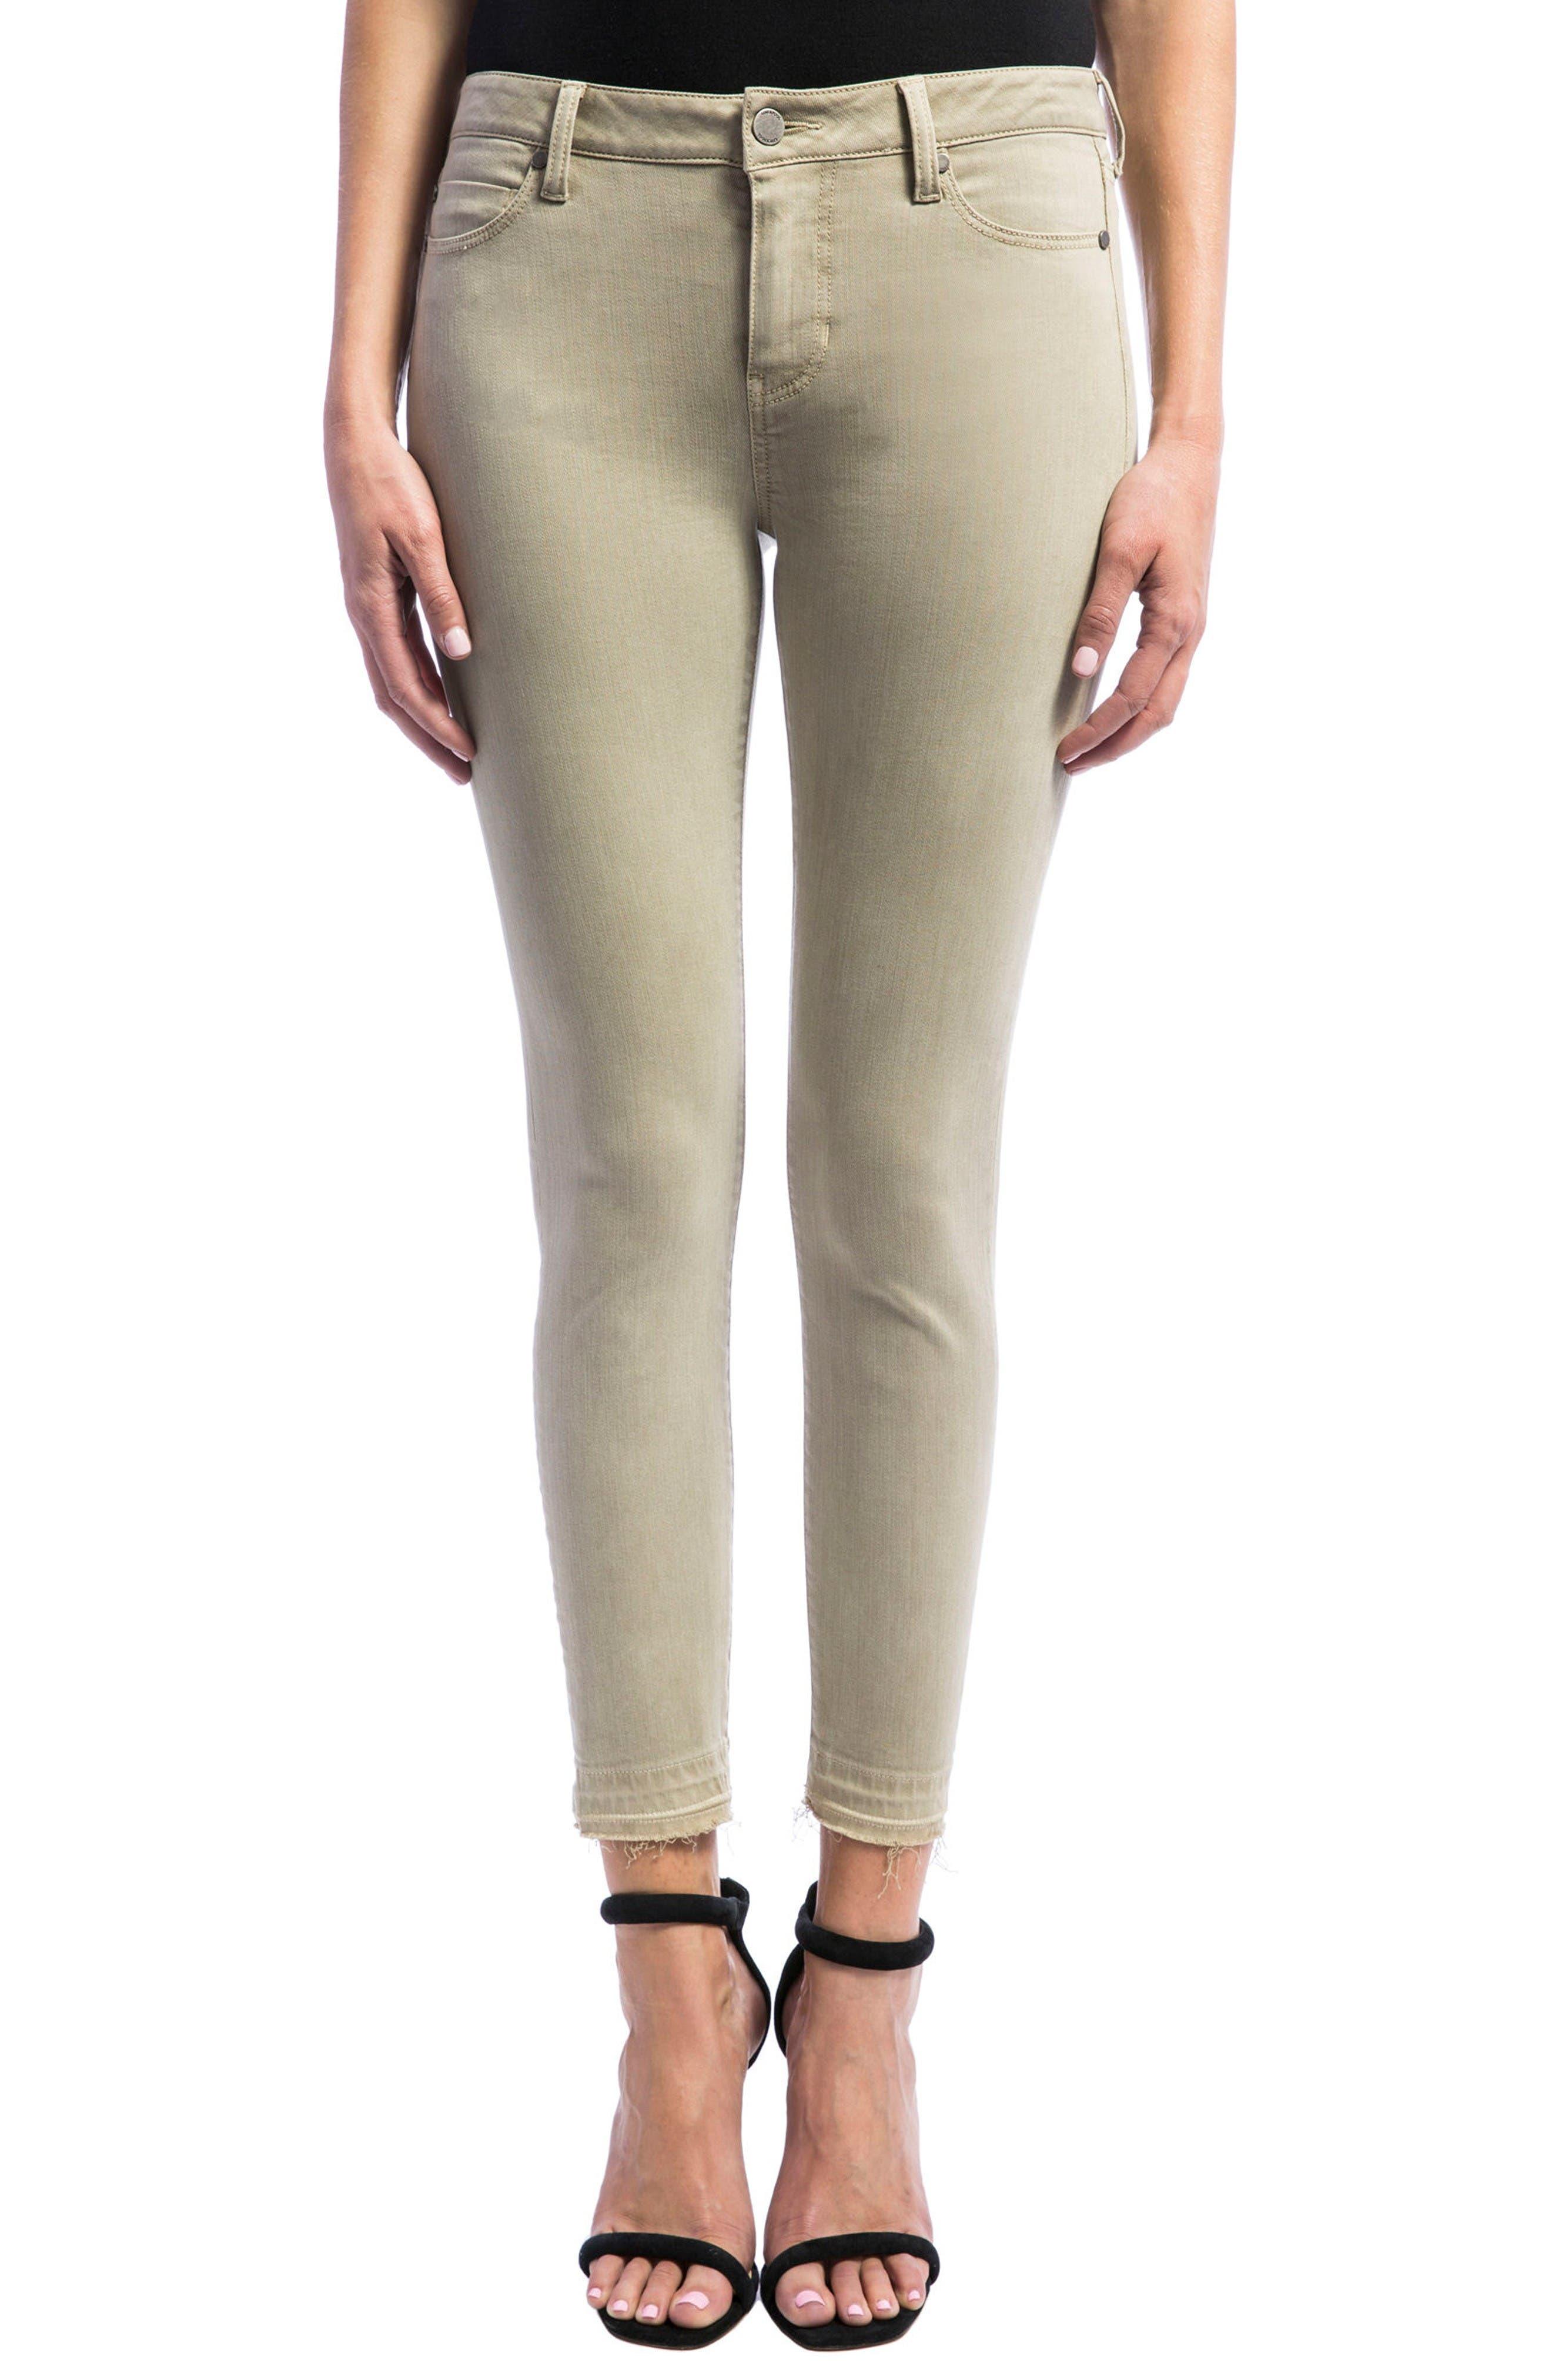 Liverpool Jeans Company Release Hem Skinny Pants